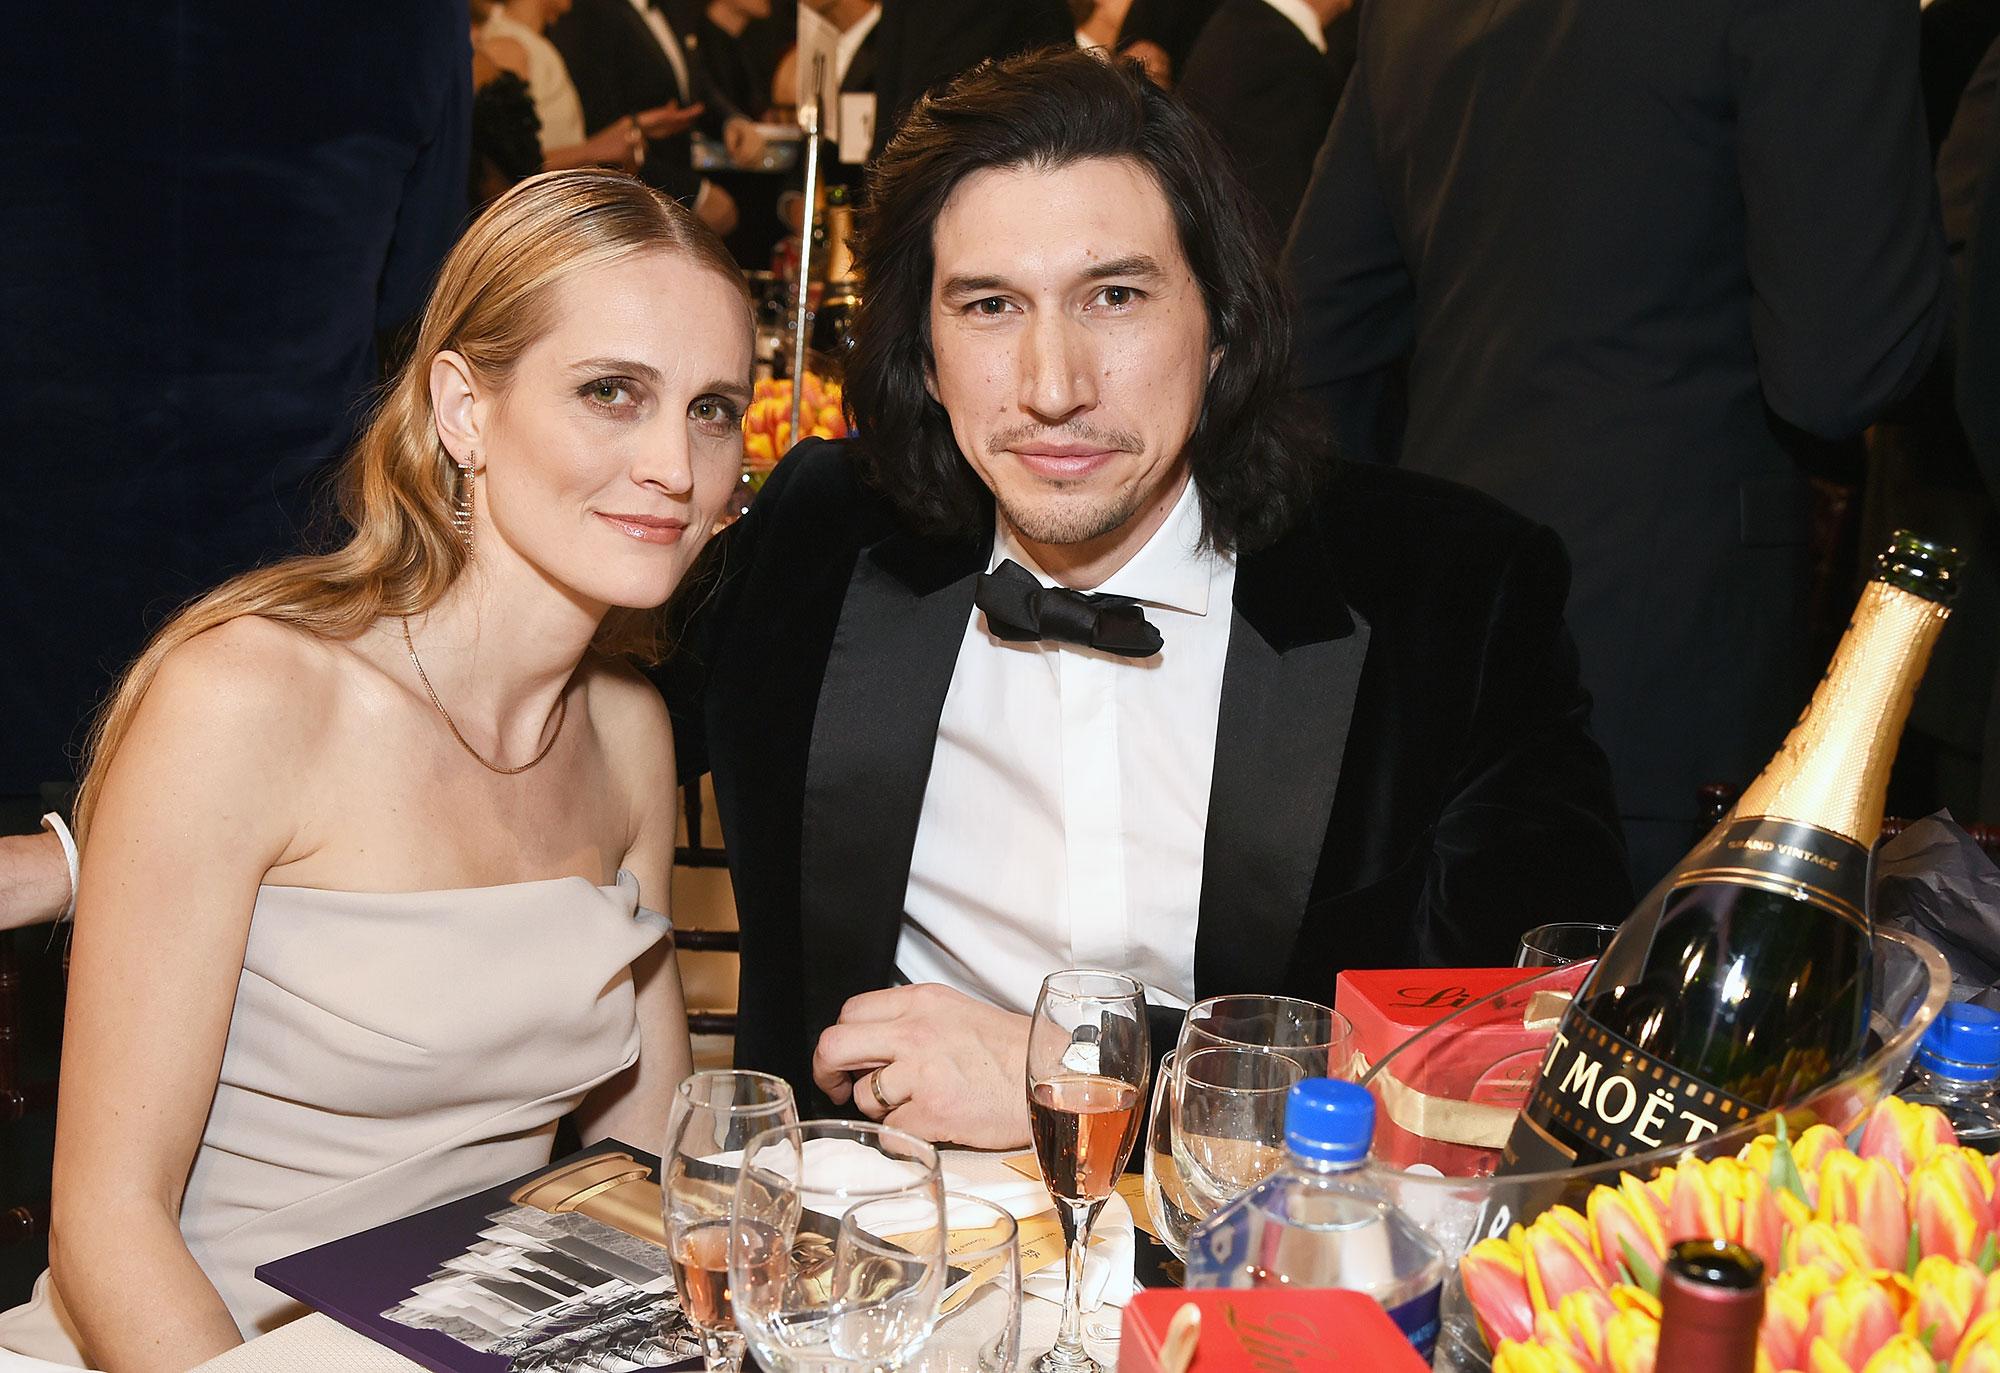 Inside Golden Globes 2019 Joanne Tucker Adam Driver - Adam Driver and wife Joanne Tucker turned the Globes into a date night.